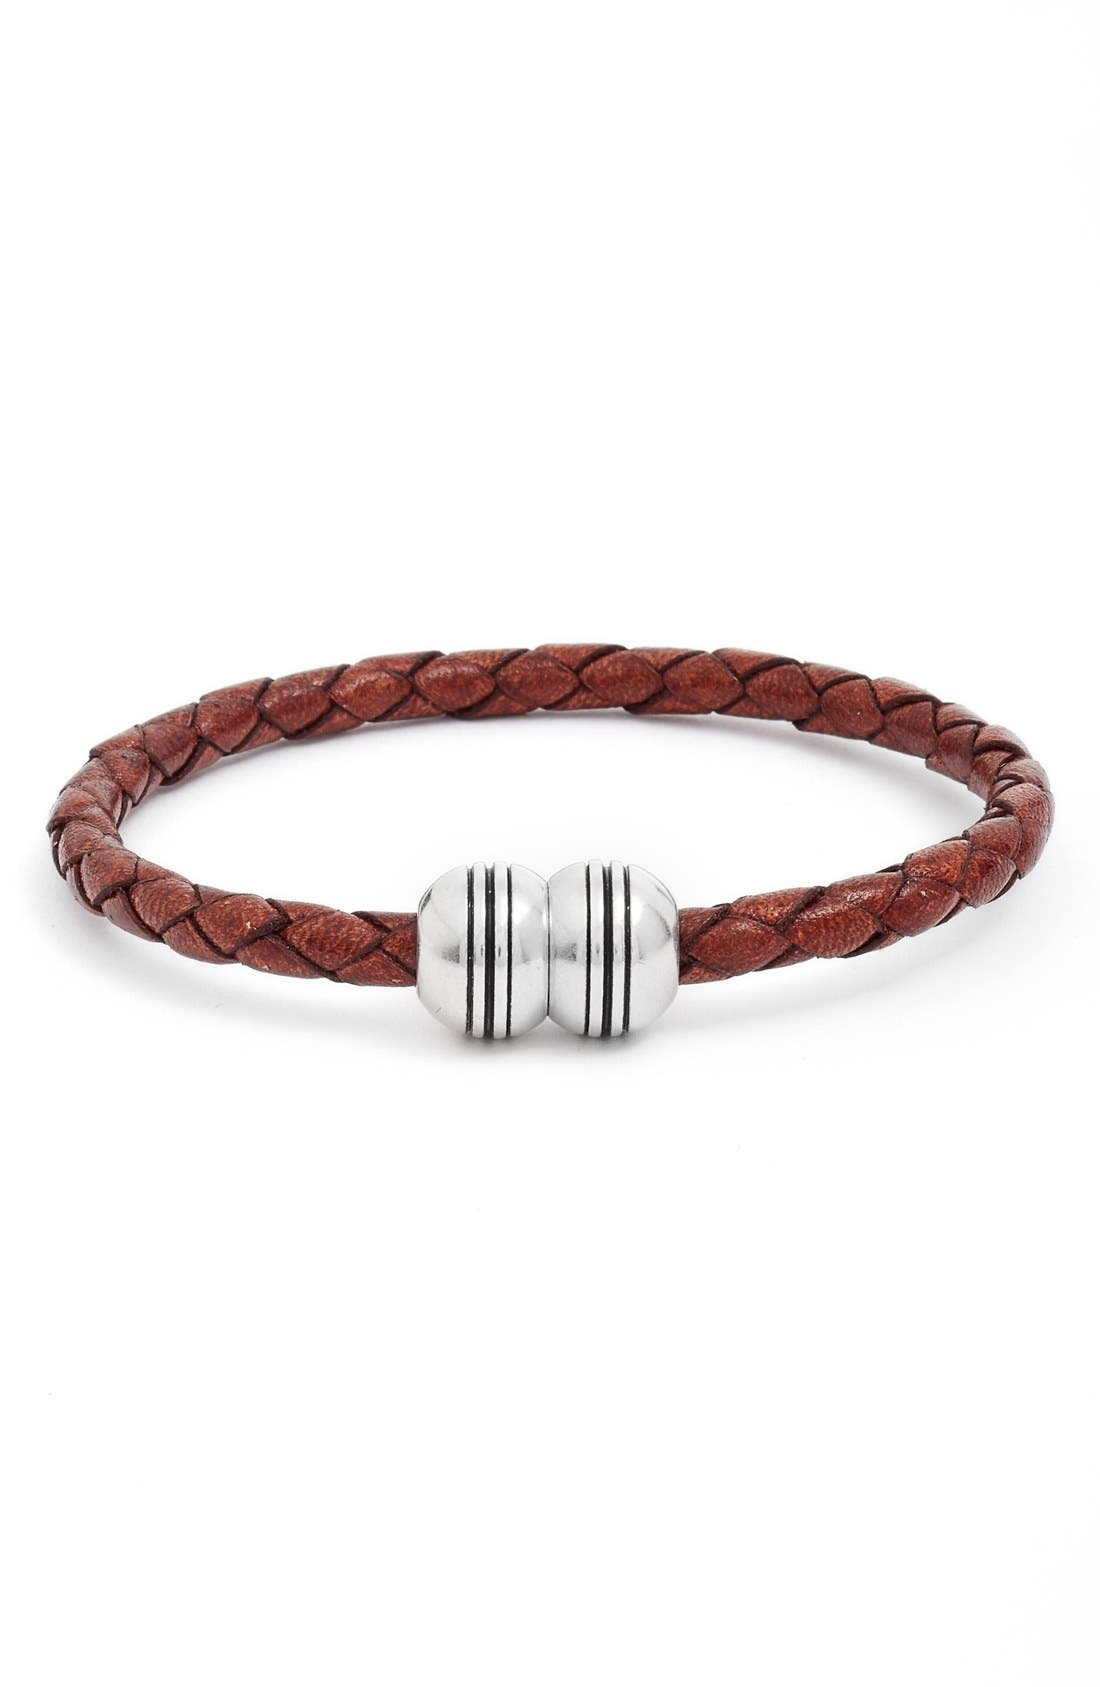 TORINO BELTS Braided Leather Bracelet